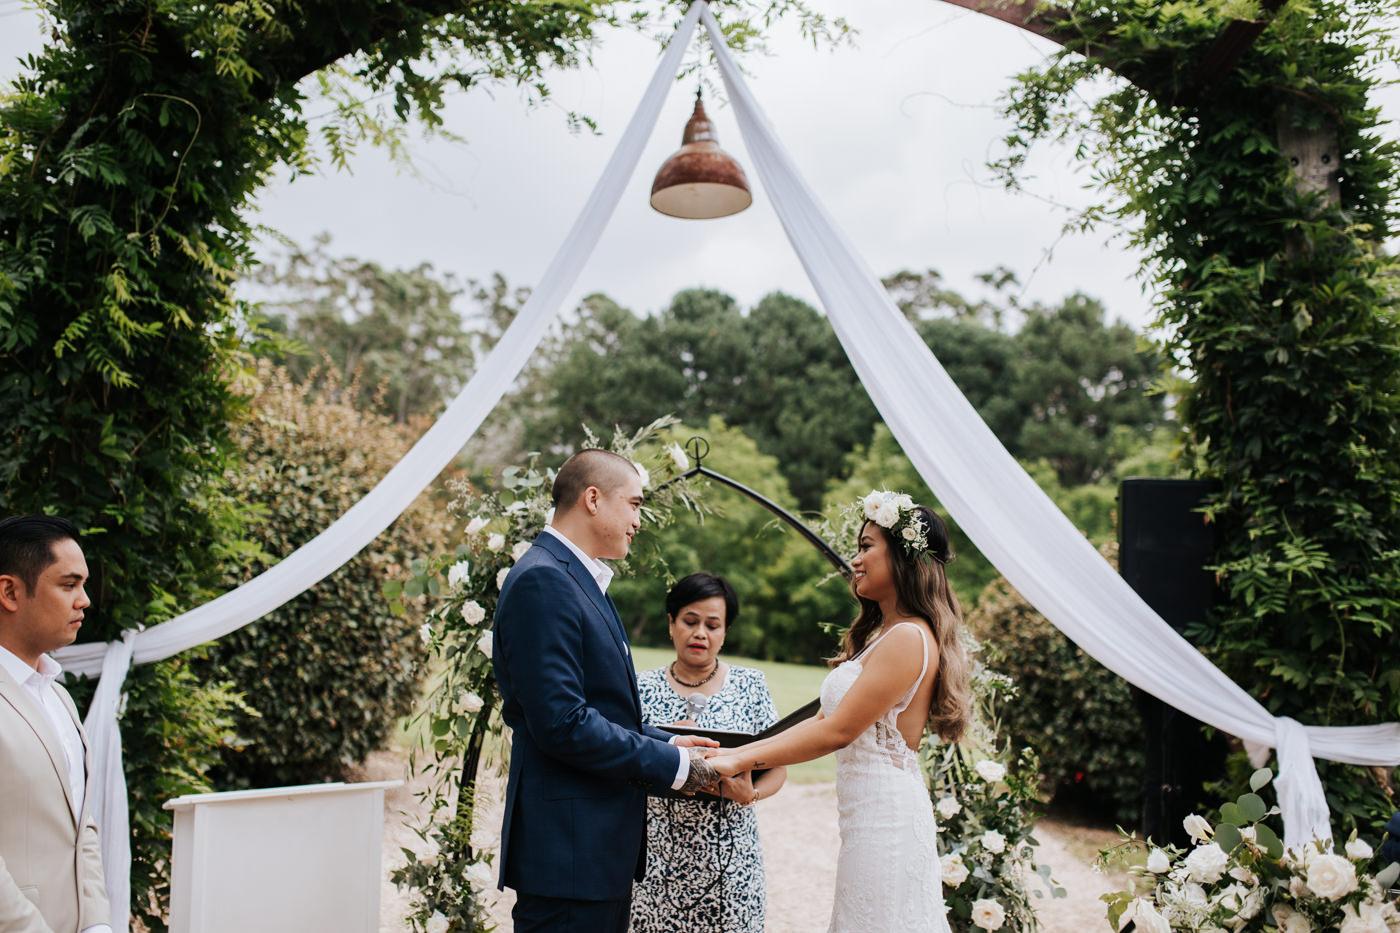 Nick & Vanezza - Fernbank Farm Wedding - Samantha Heather Photography-61.jpg